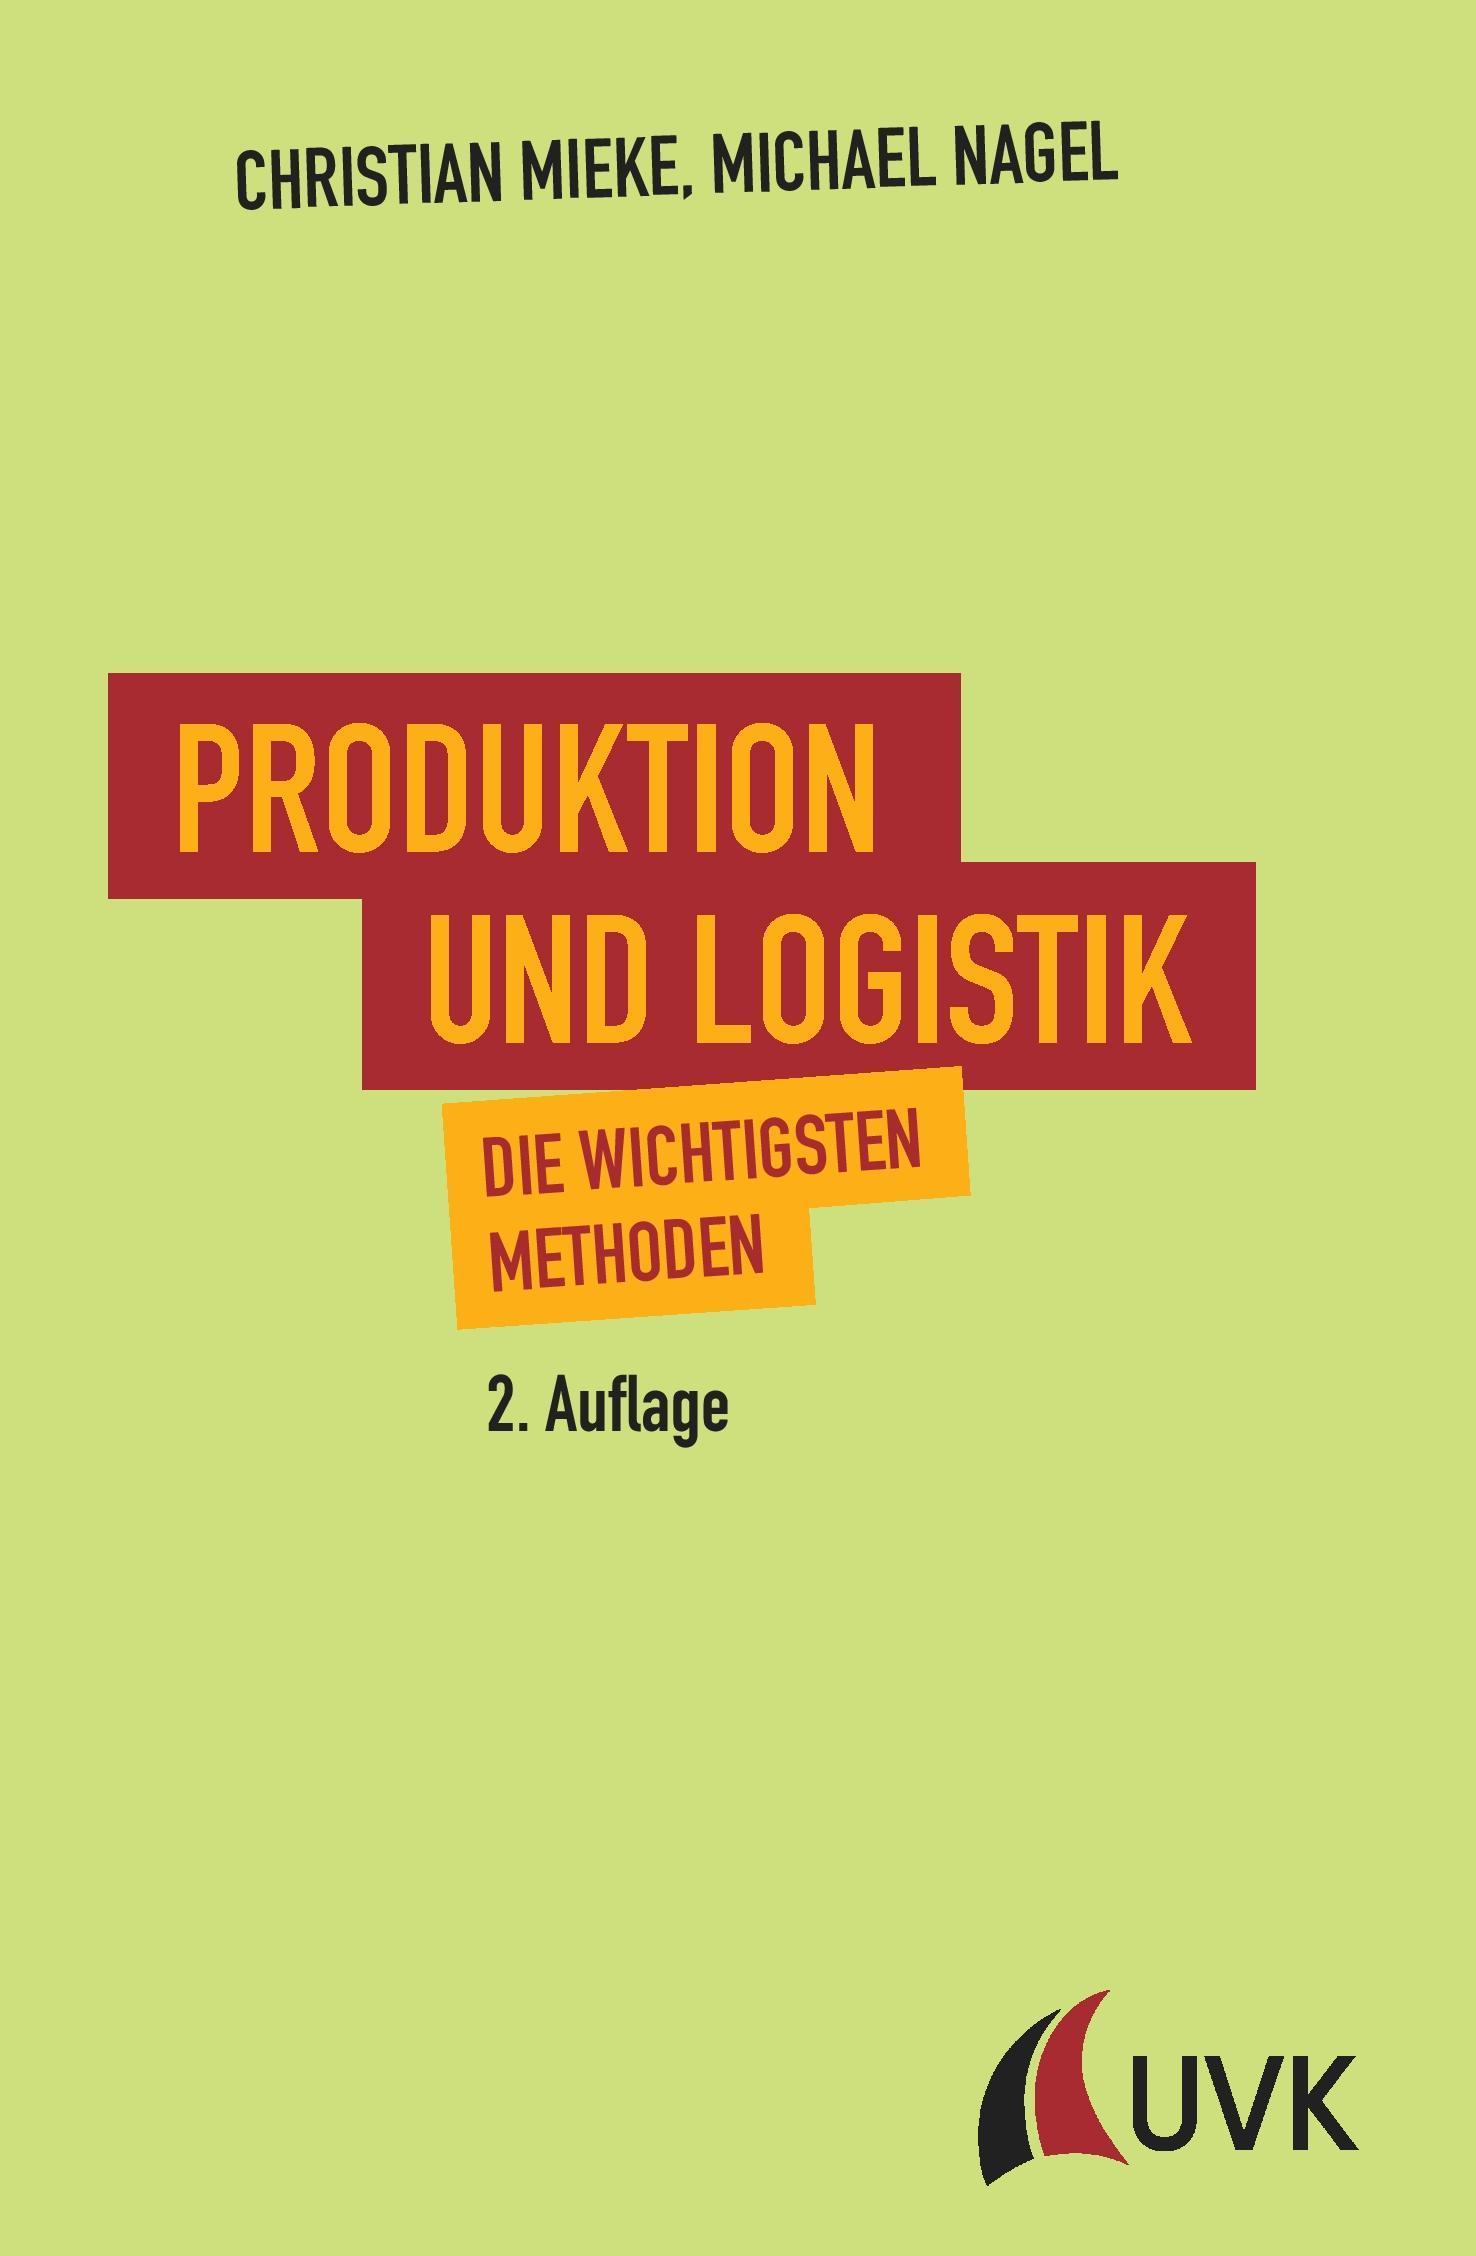 Produktion und Logistik Michael Nagel